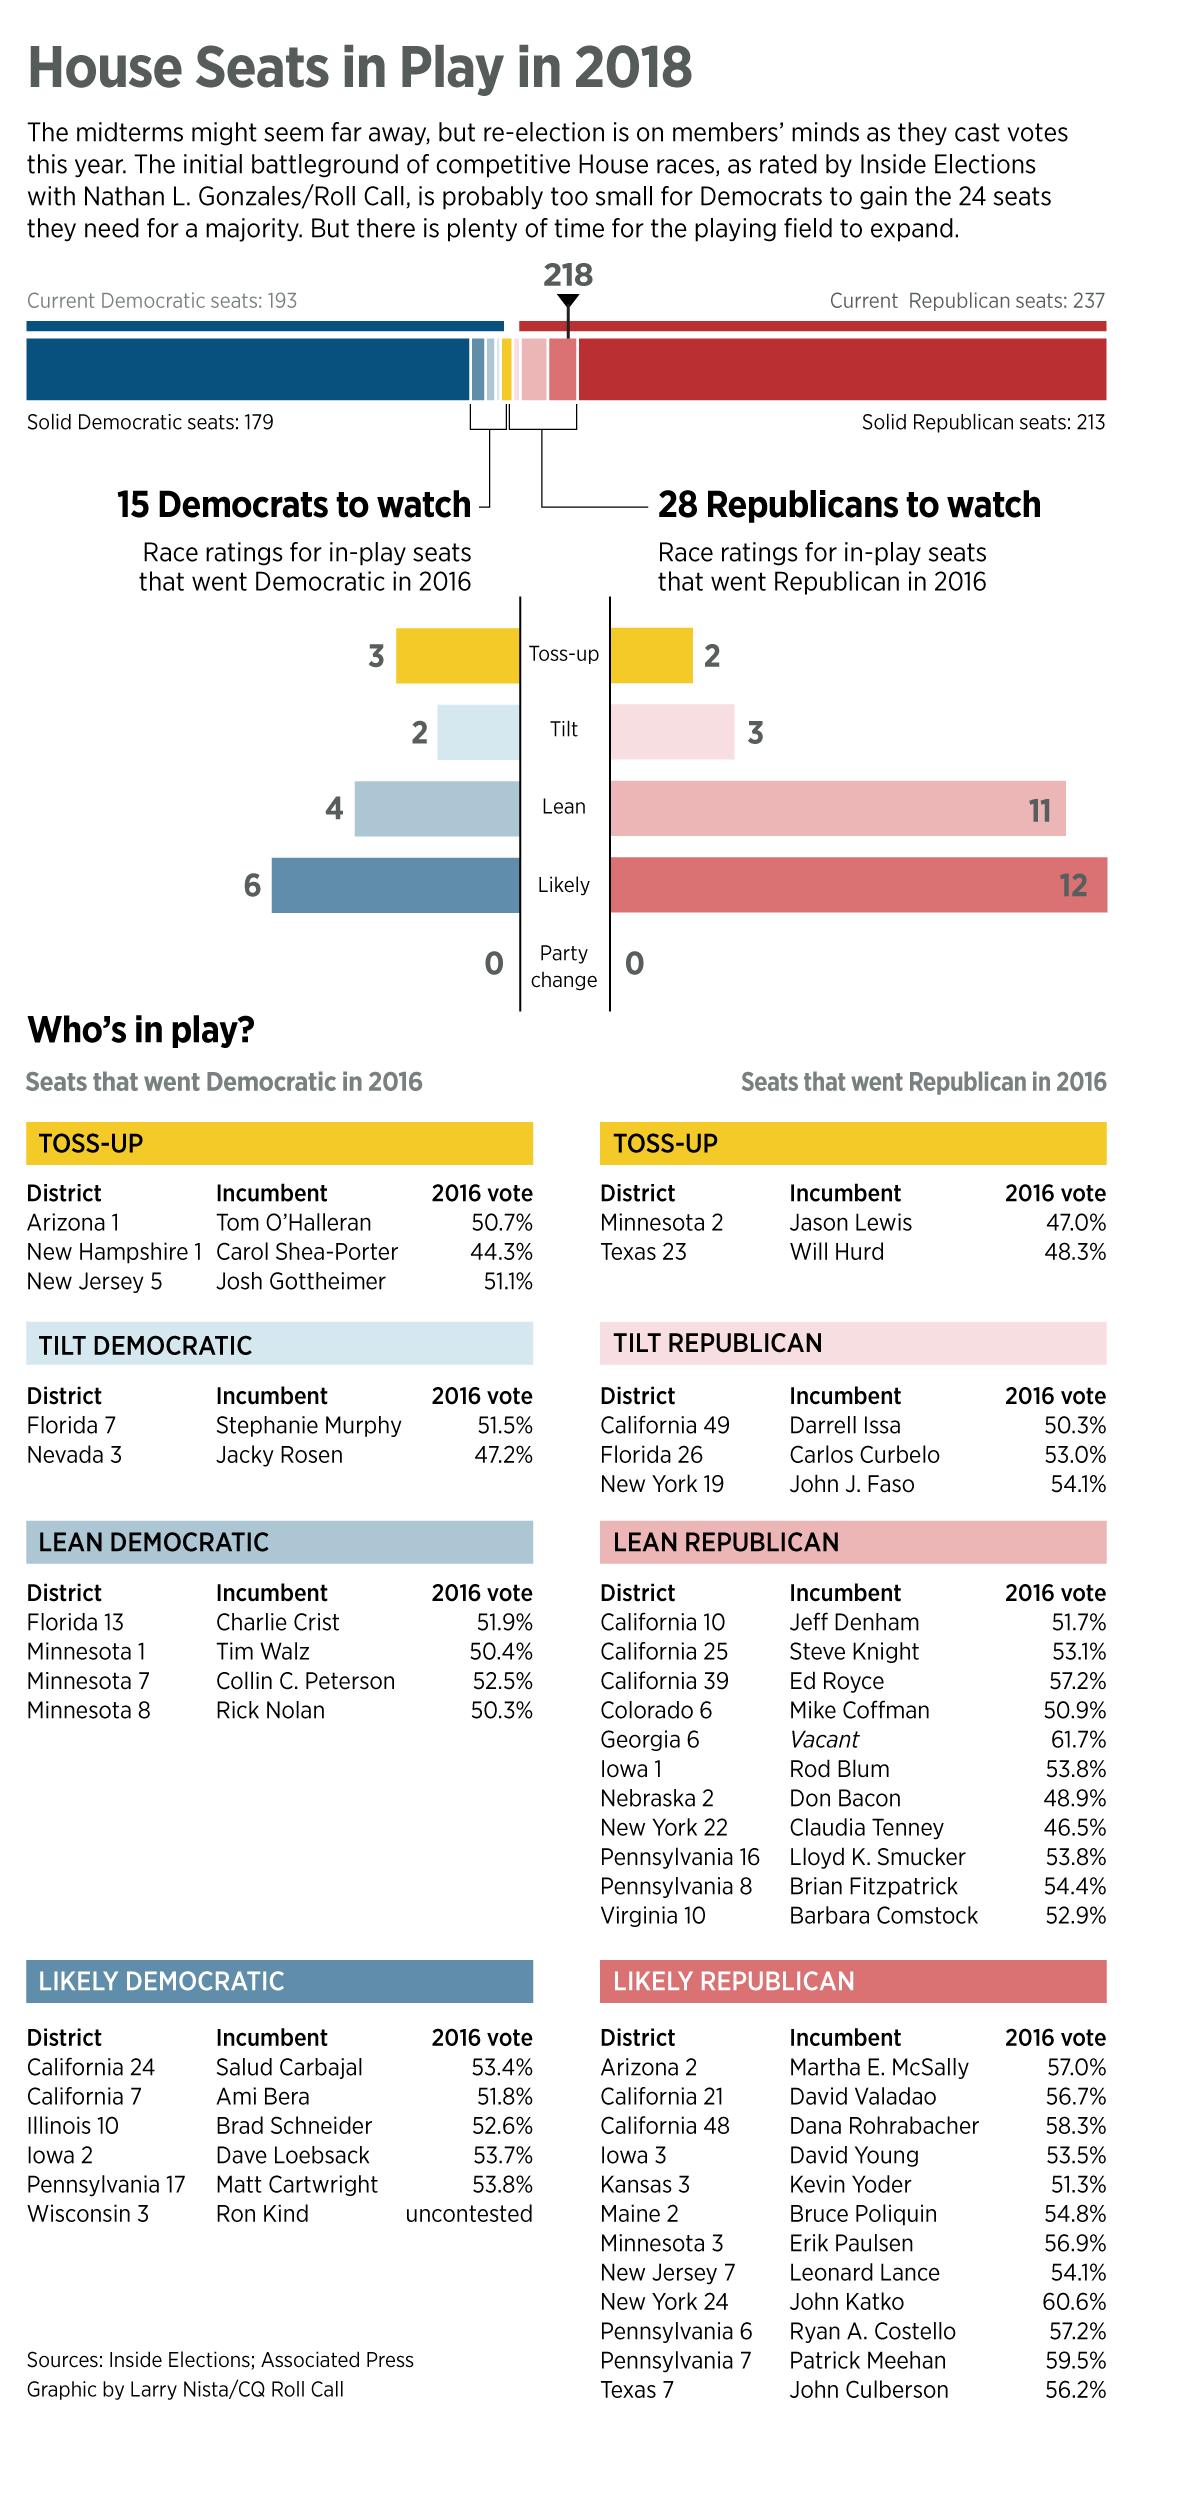 House Republicans Shouldn't Get Too Comfortable in Majority